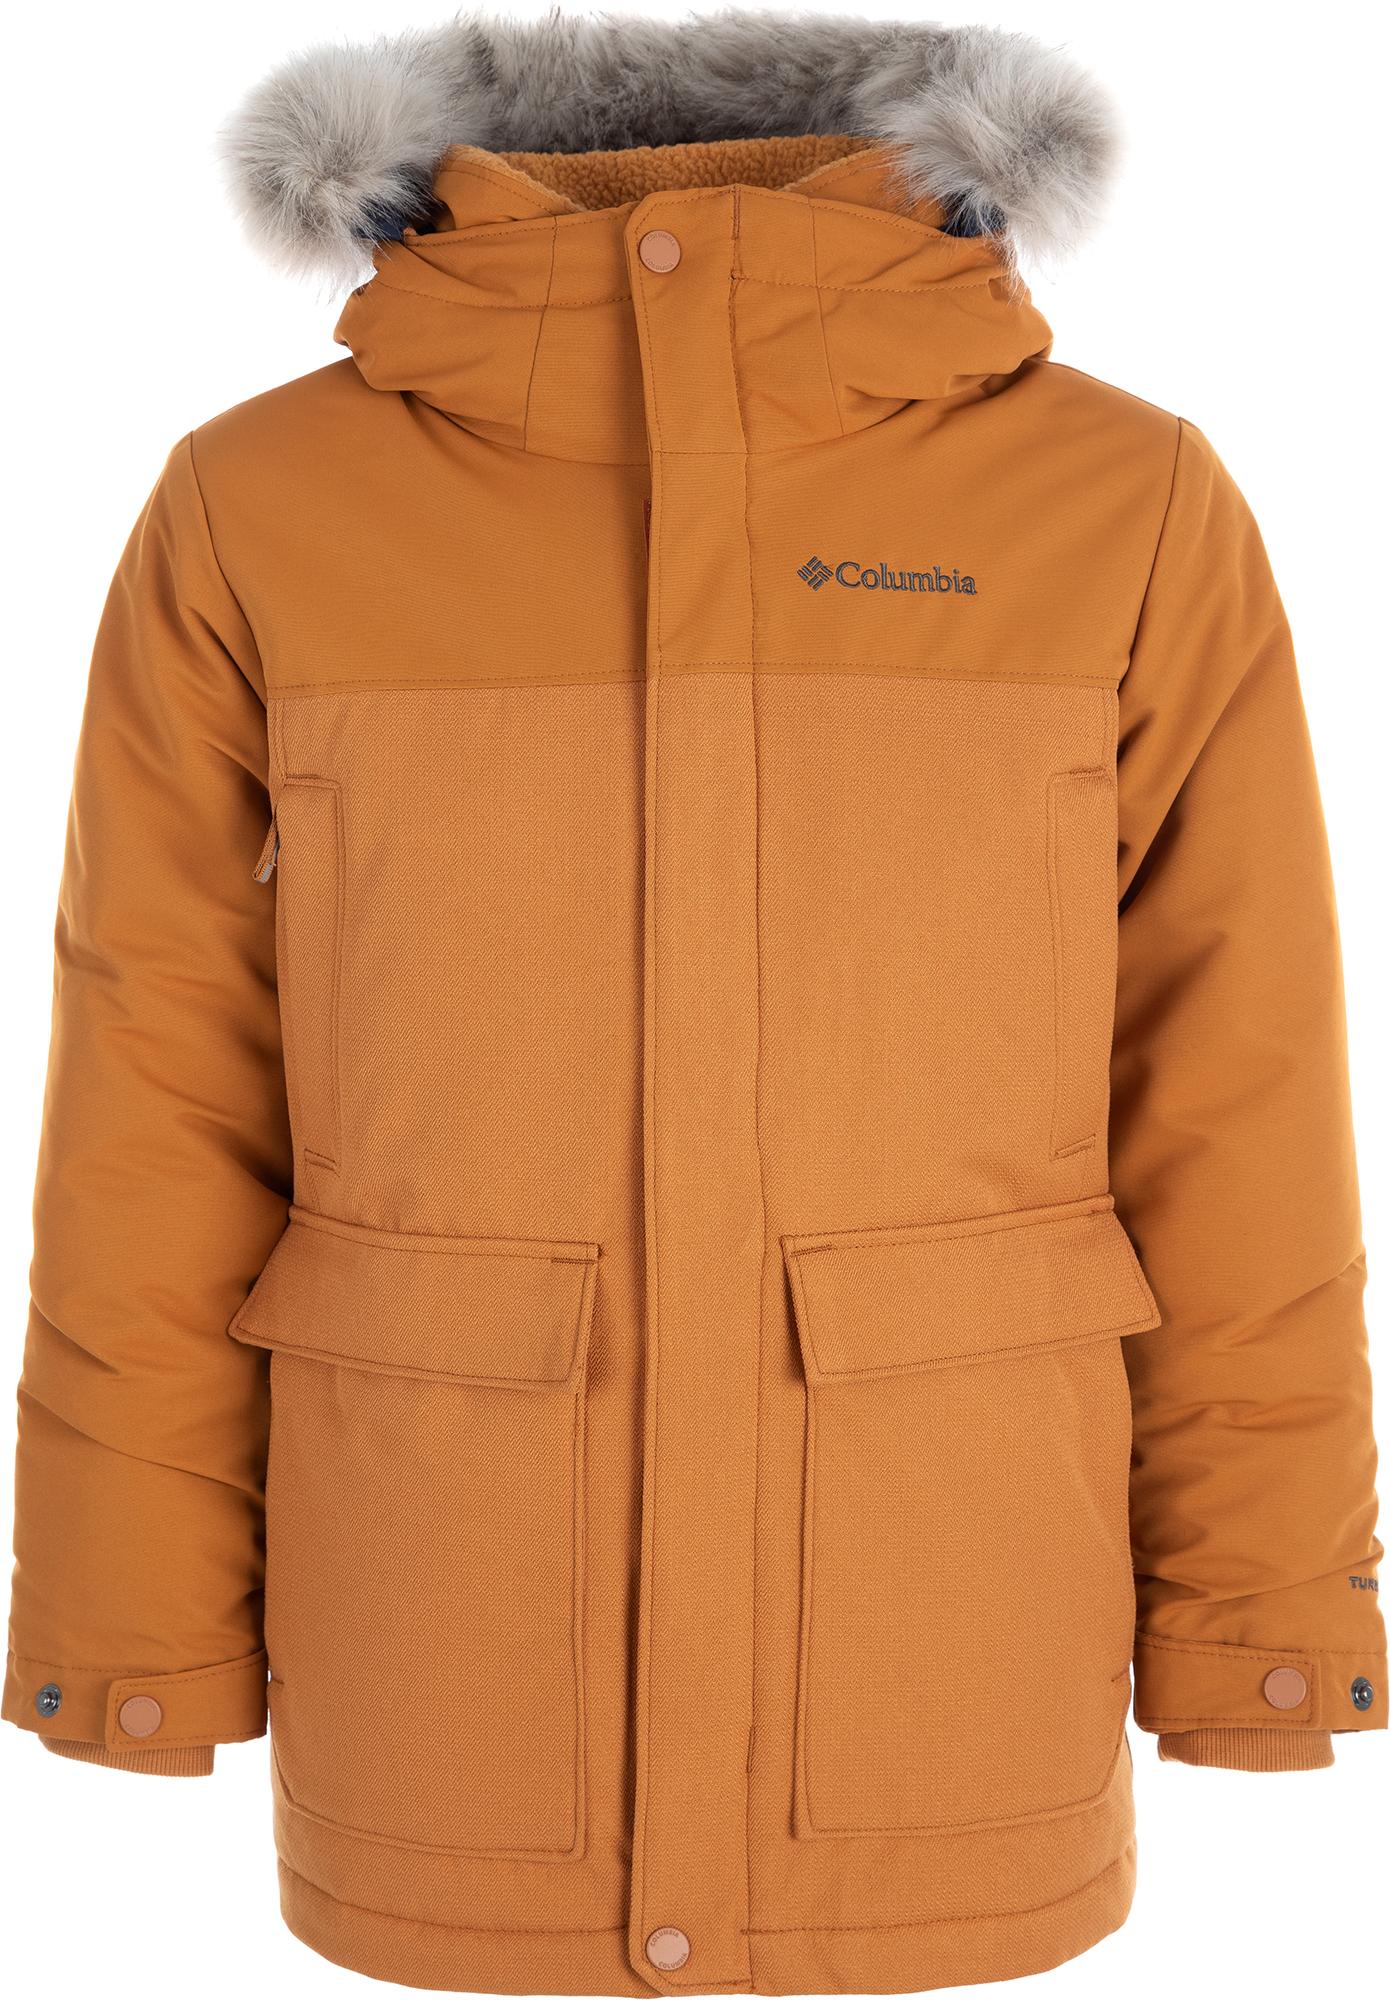 цена на Columbia Куртка пуховая для мальчиков Columbia Boundary Bay, размер 159-167